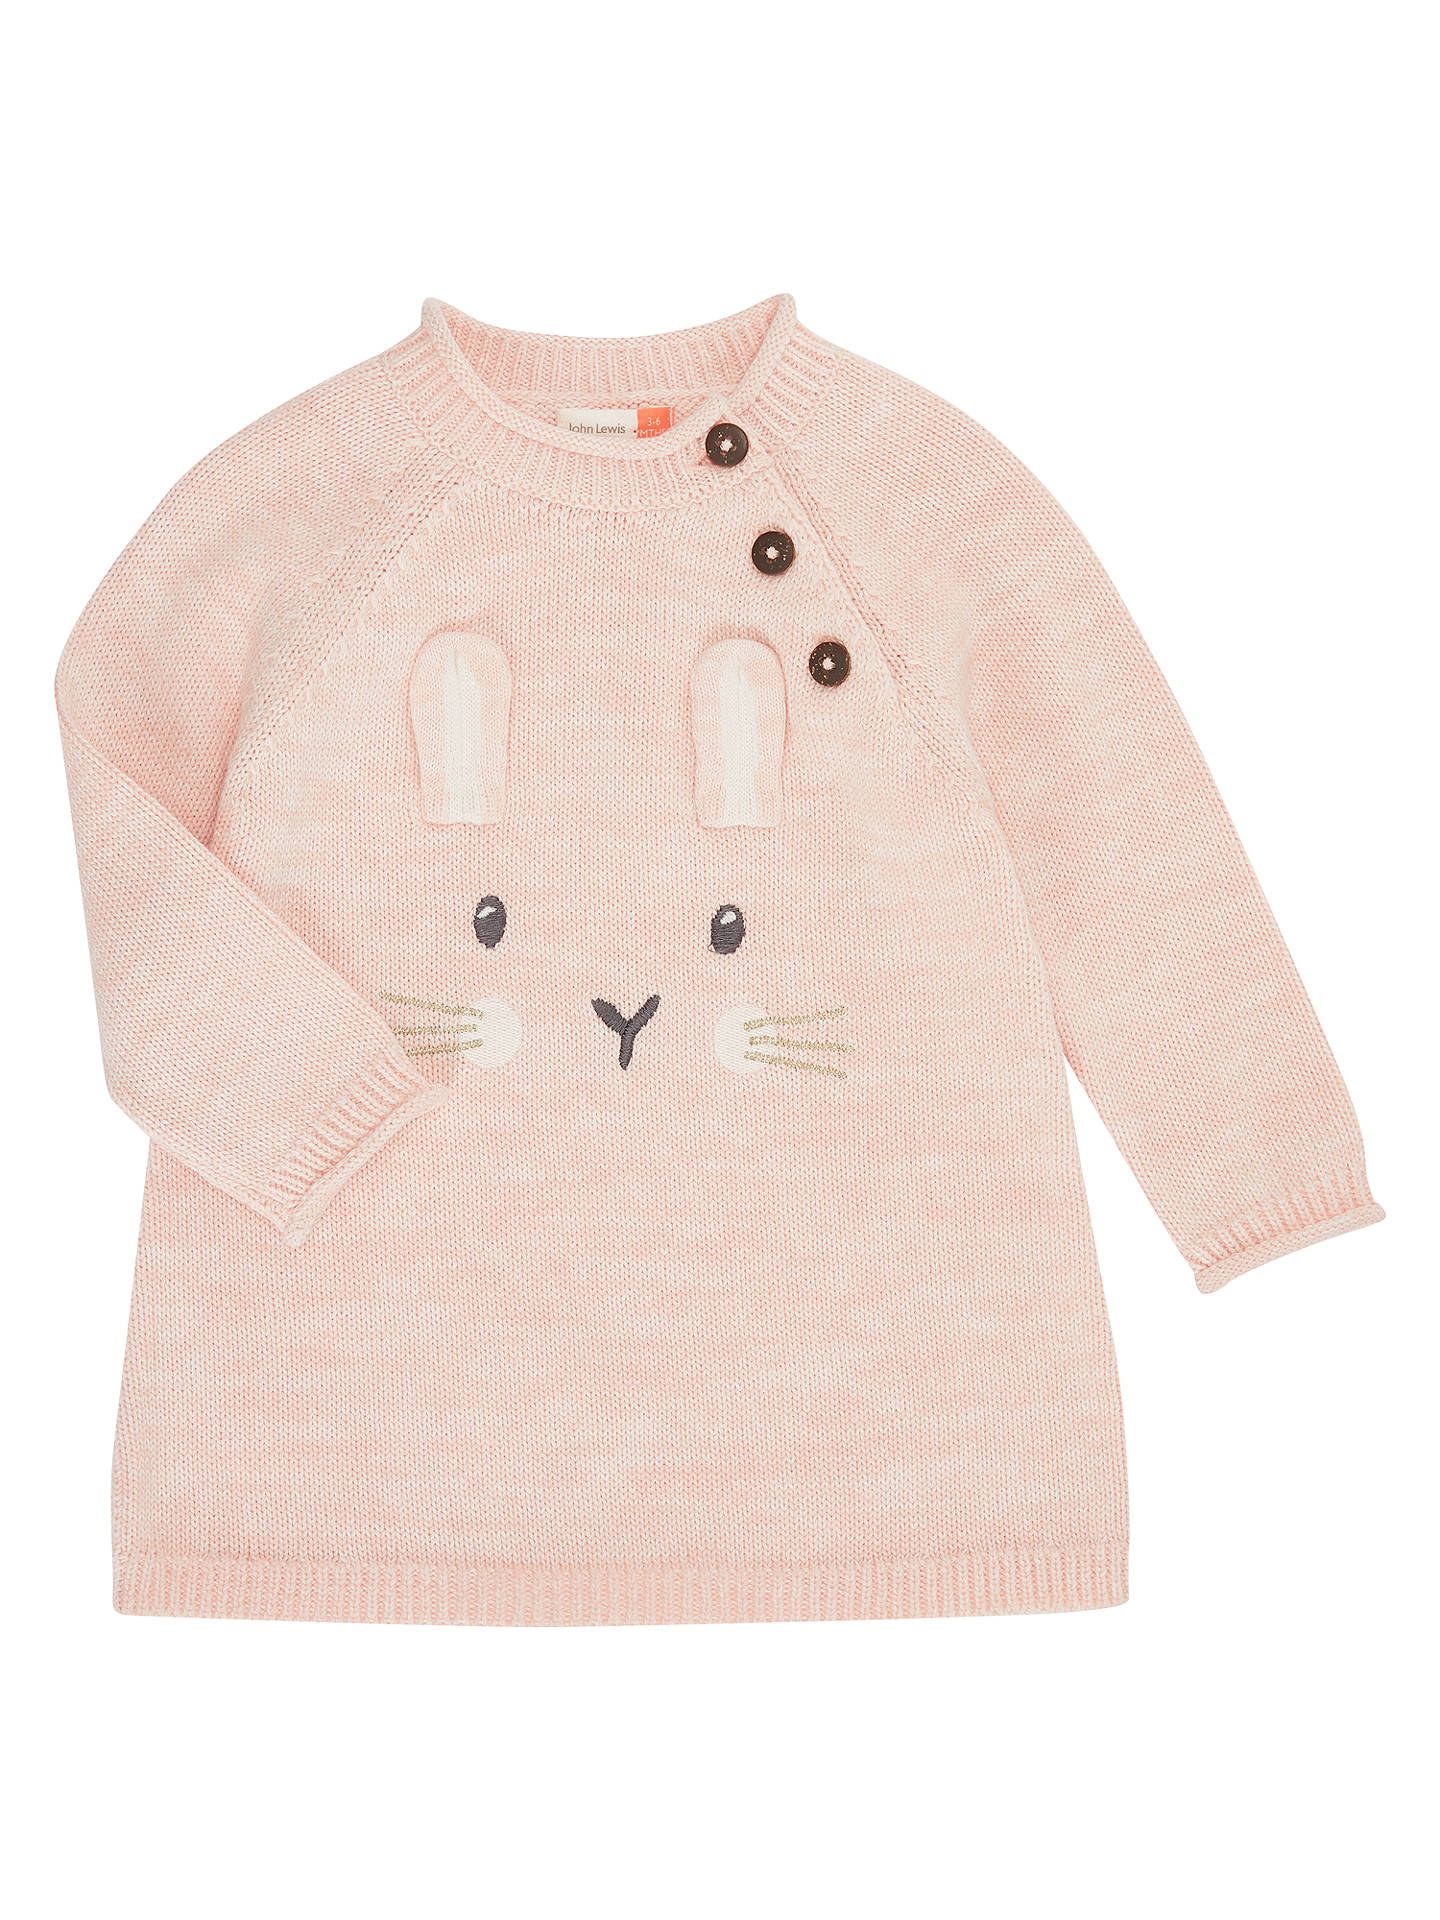 f398b6ce5a8c John Lewis Baby Bunny Jumper Dress